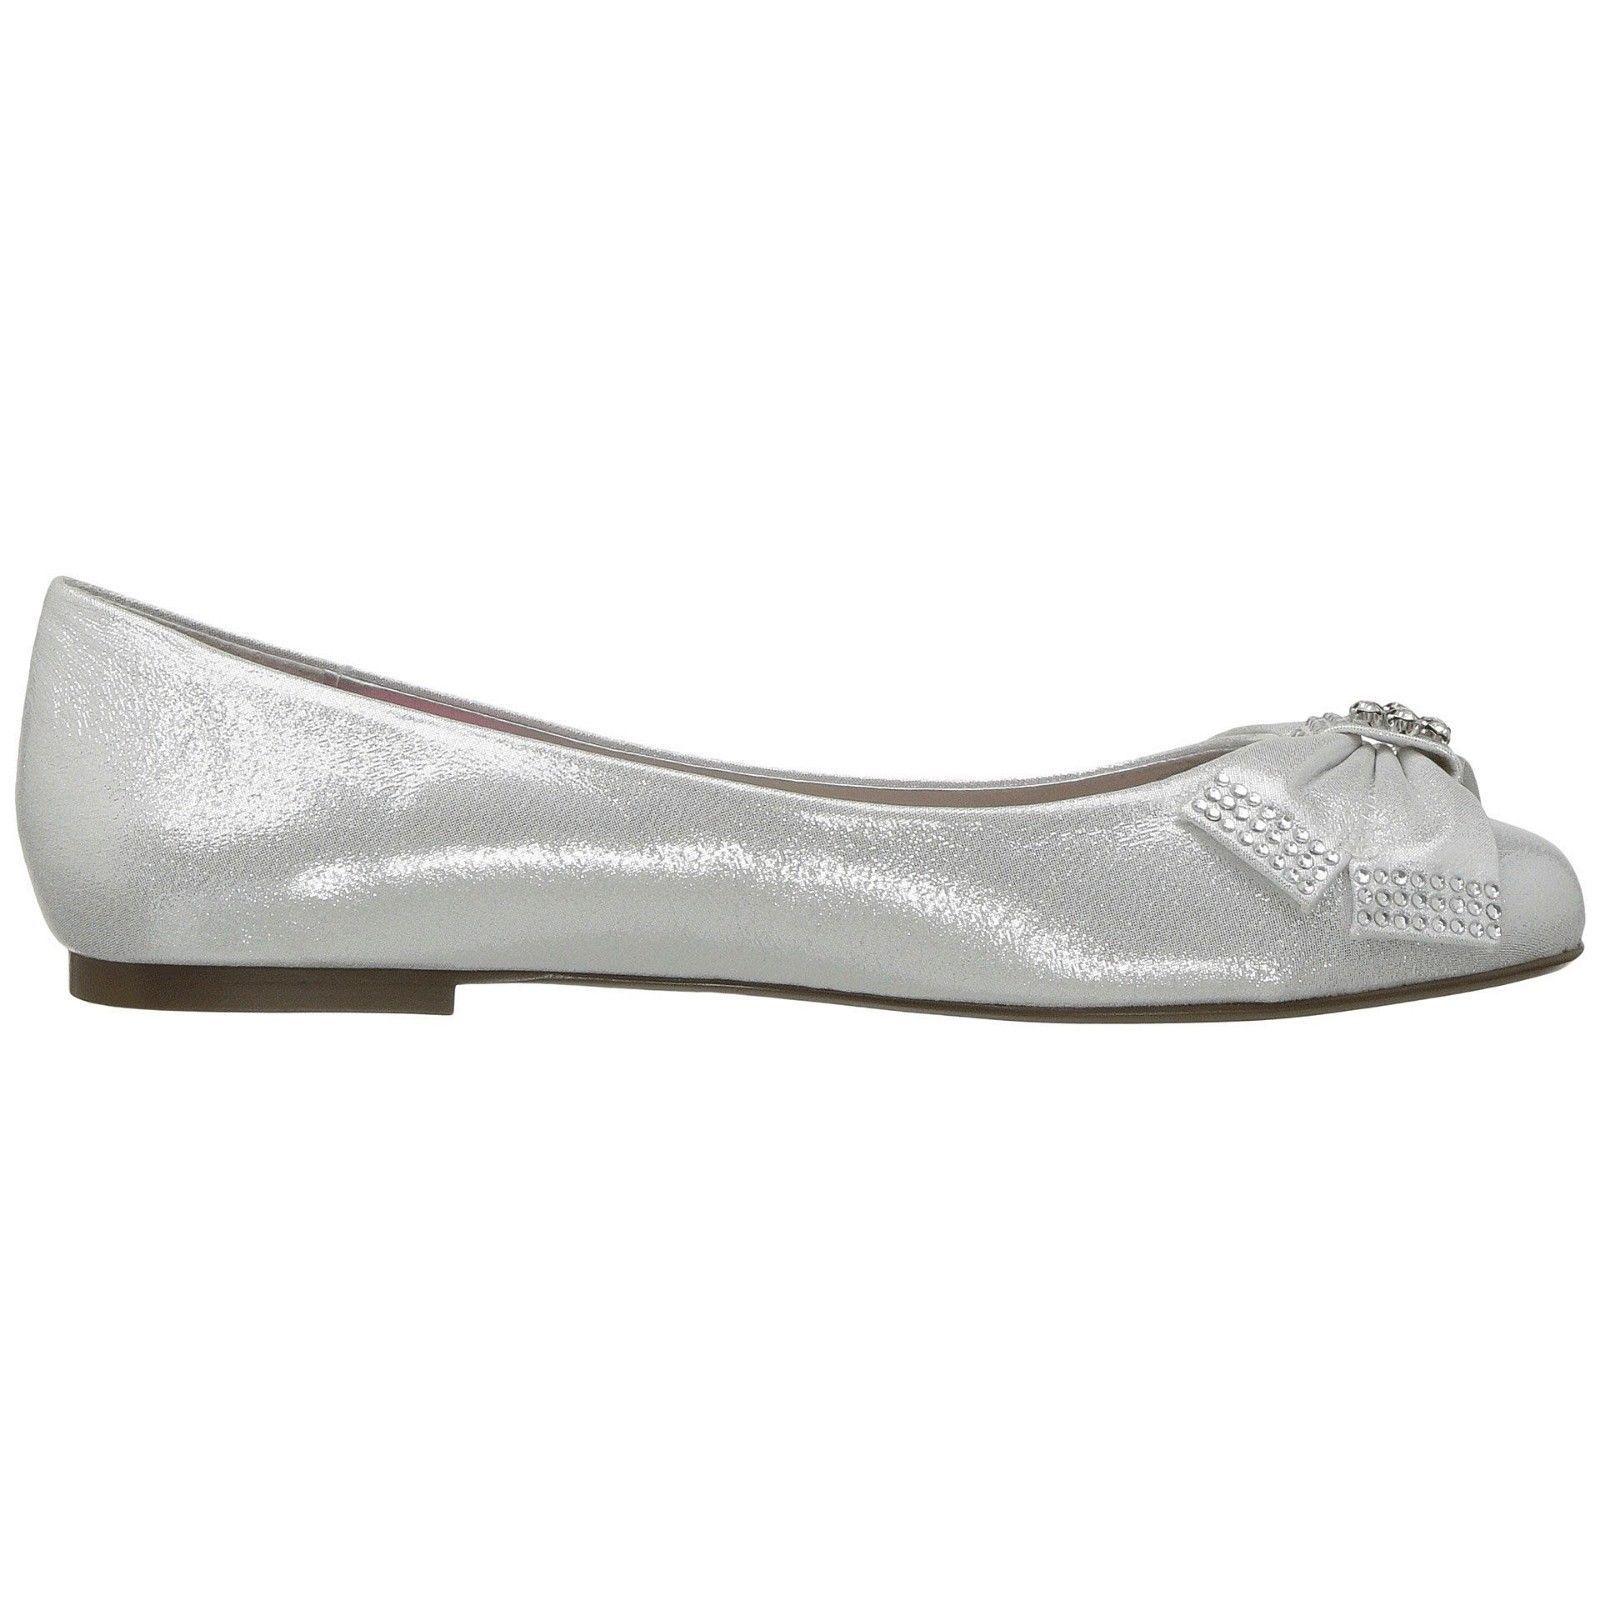 Betsey Johnson Emy Silver Metallic Satin Crystal Bow Flat Shoes 7 NIB